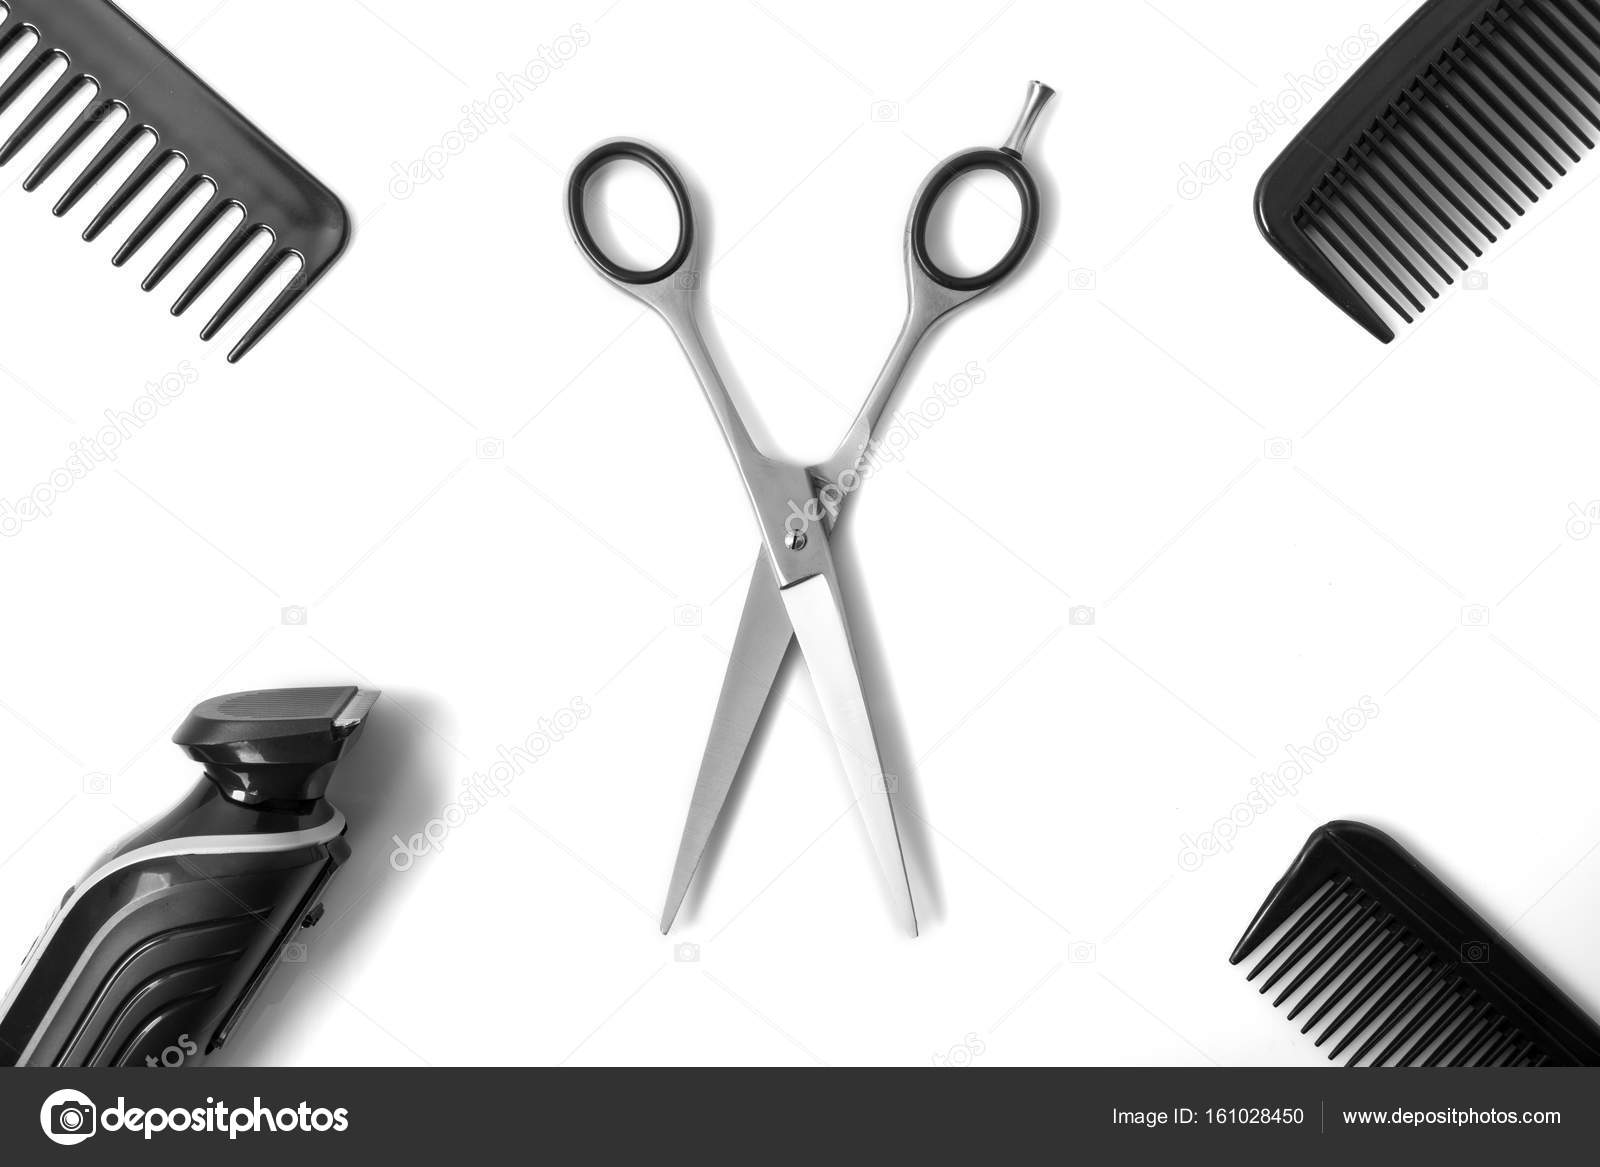 Haircut items, scissors in middle \u2014 Stock Photo © icemanj